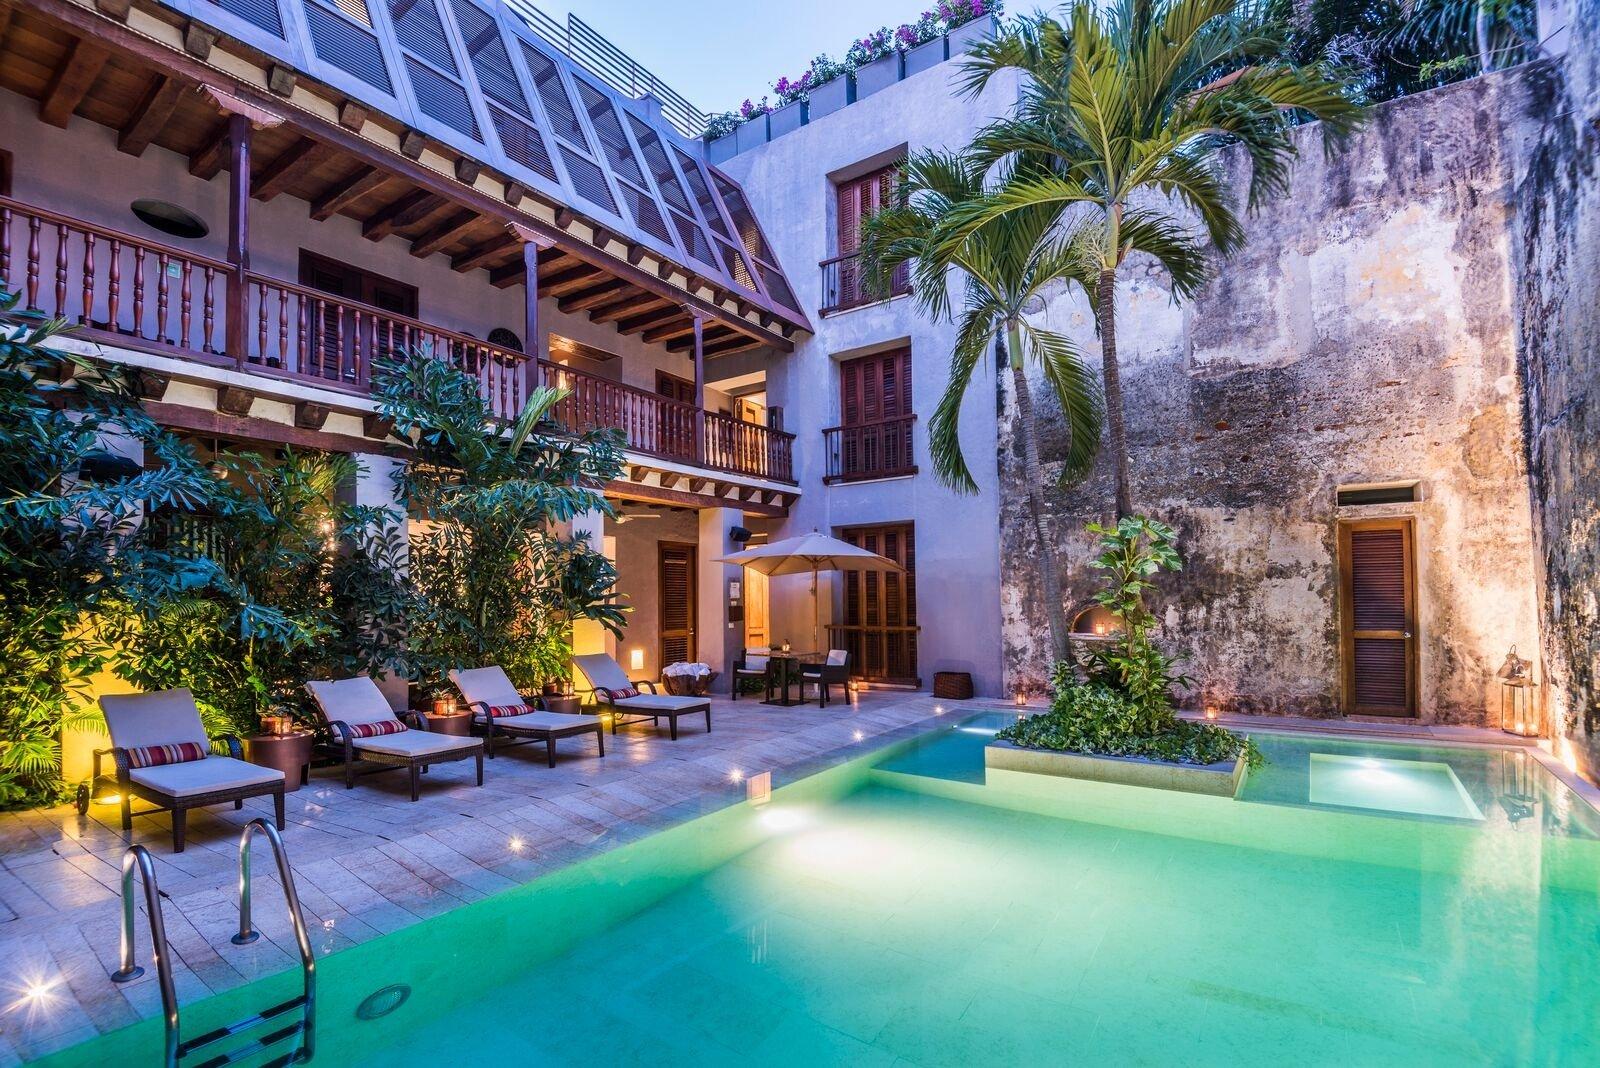 Hotel Pestagua, Cartagena, Colombia